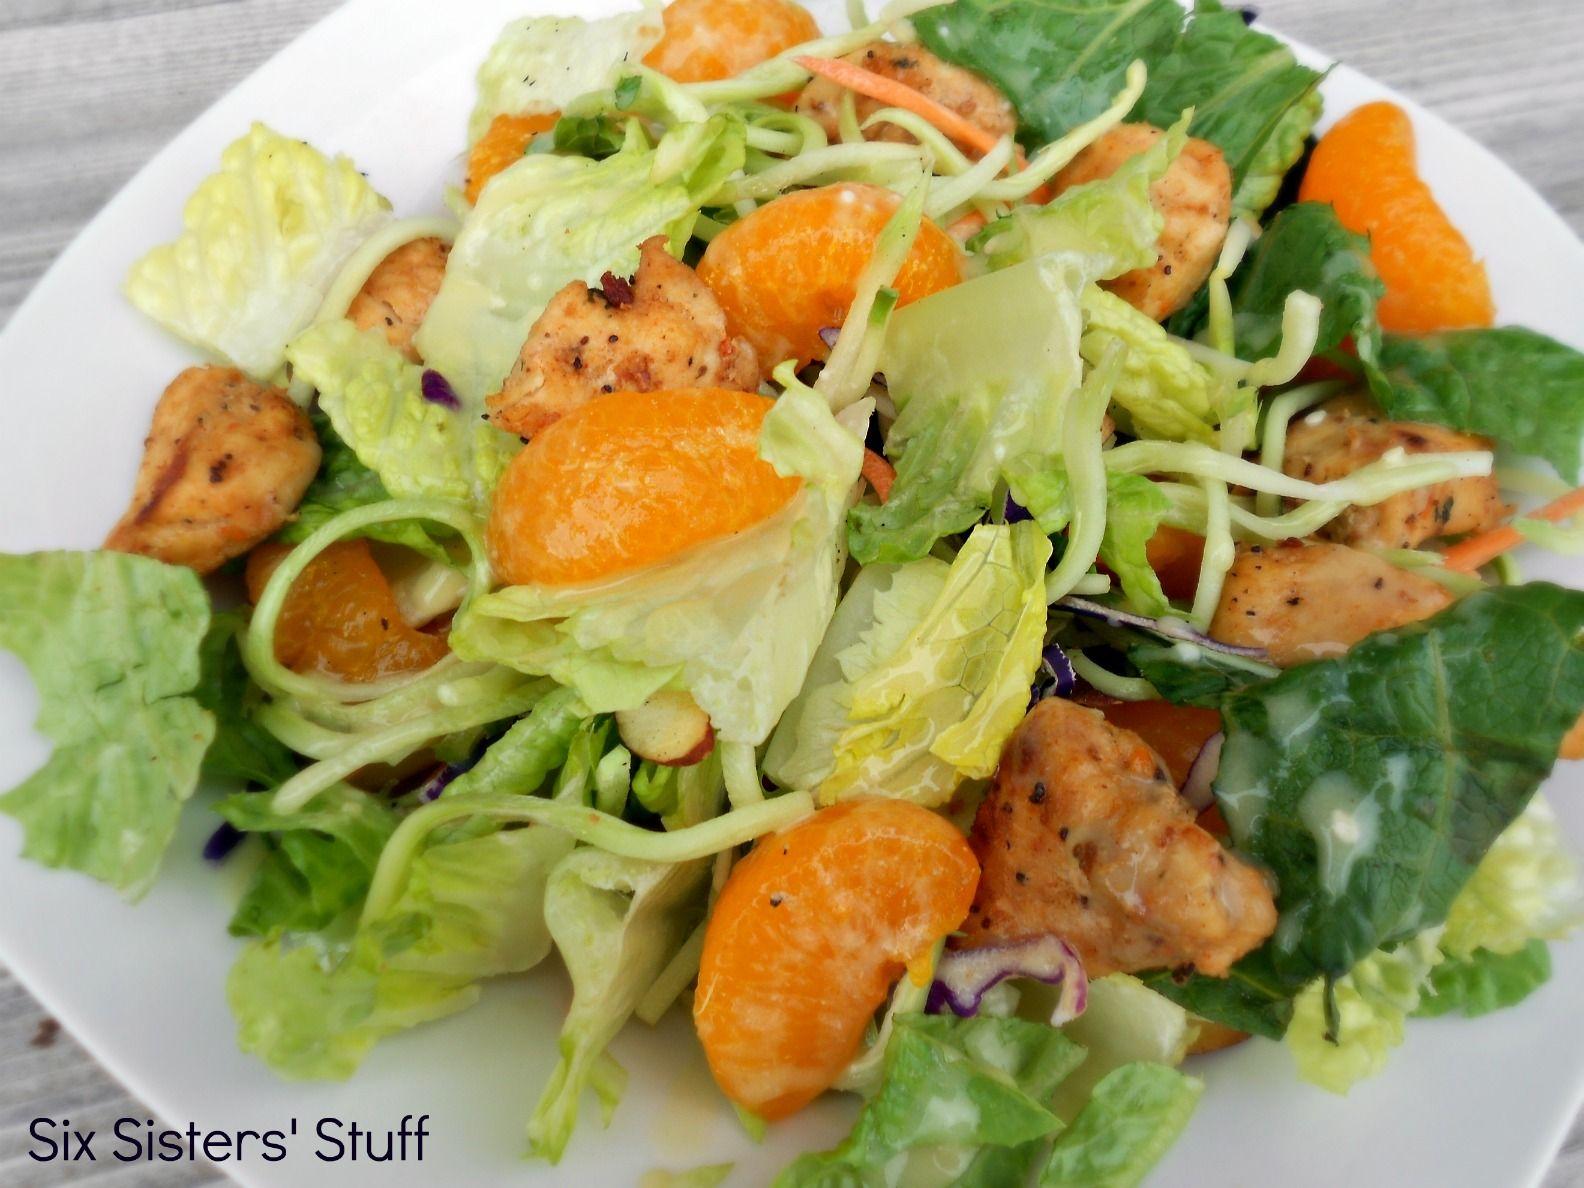 Applebee's Oriental Chicken Salad. A delicious, restaurant